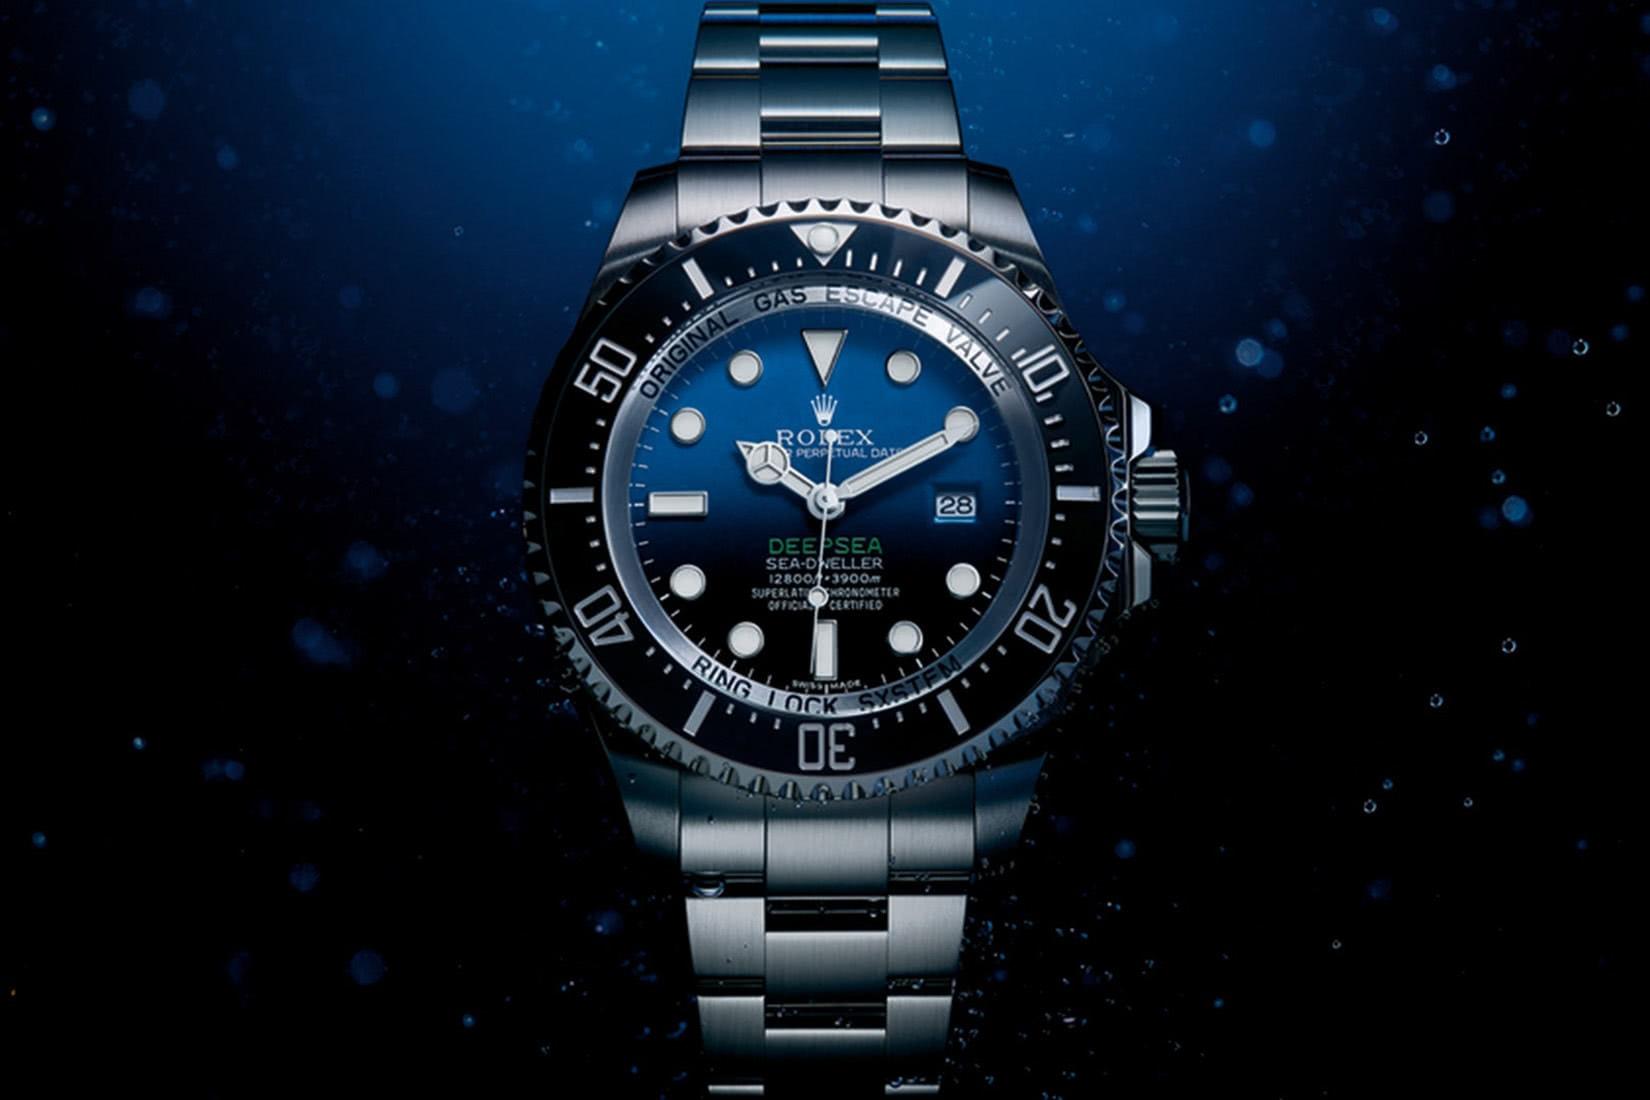 watch water resistance atm - Luxe Digital